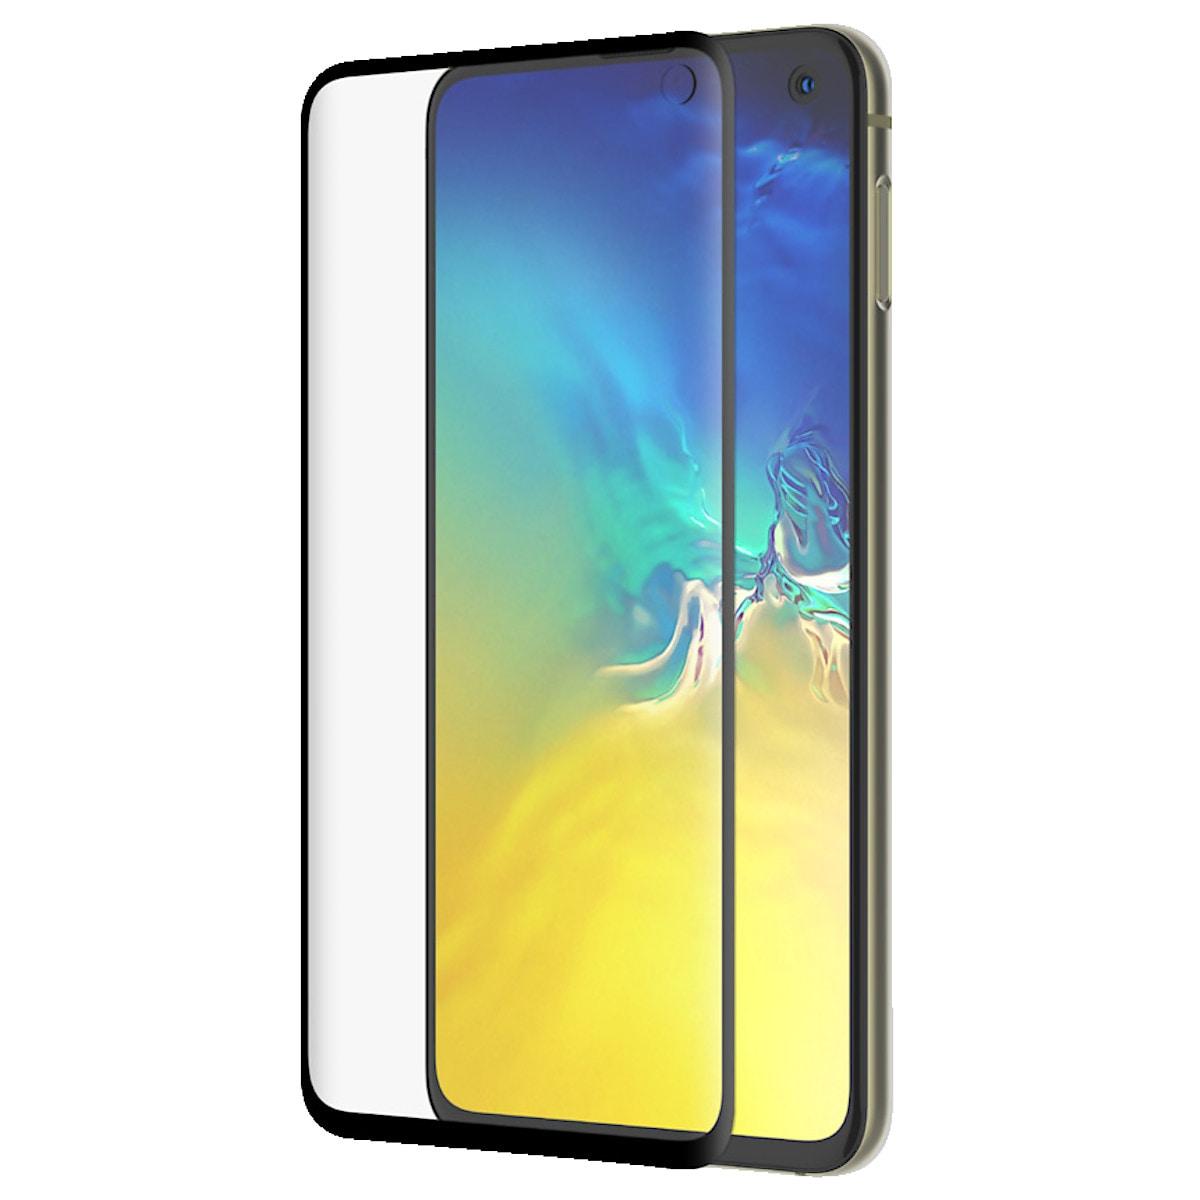 Displayschutz Samsung Galaxy S10e, Belkin Screenforce TemperedCurve